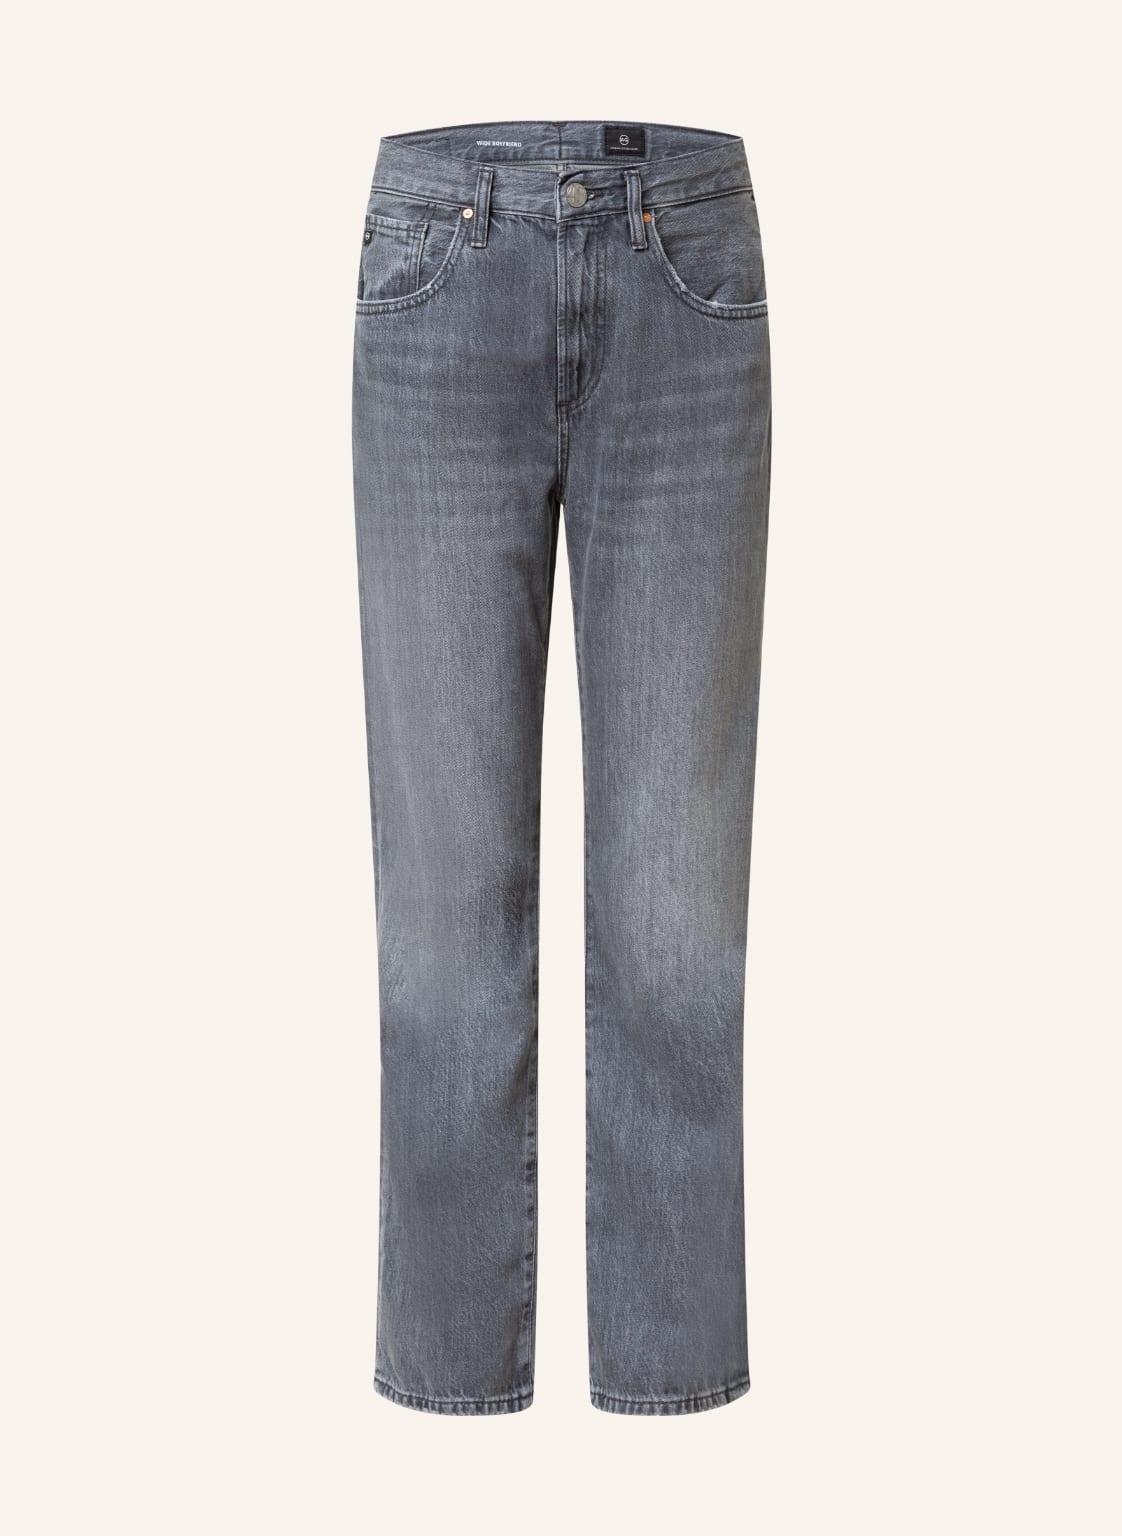 Image of Ag Jeans Boyfriend Jeans grau